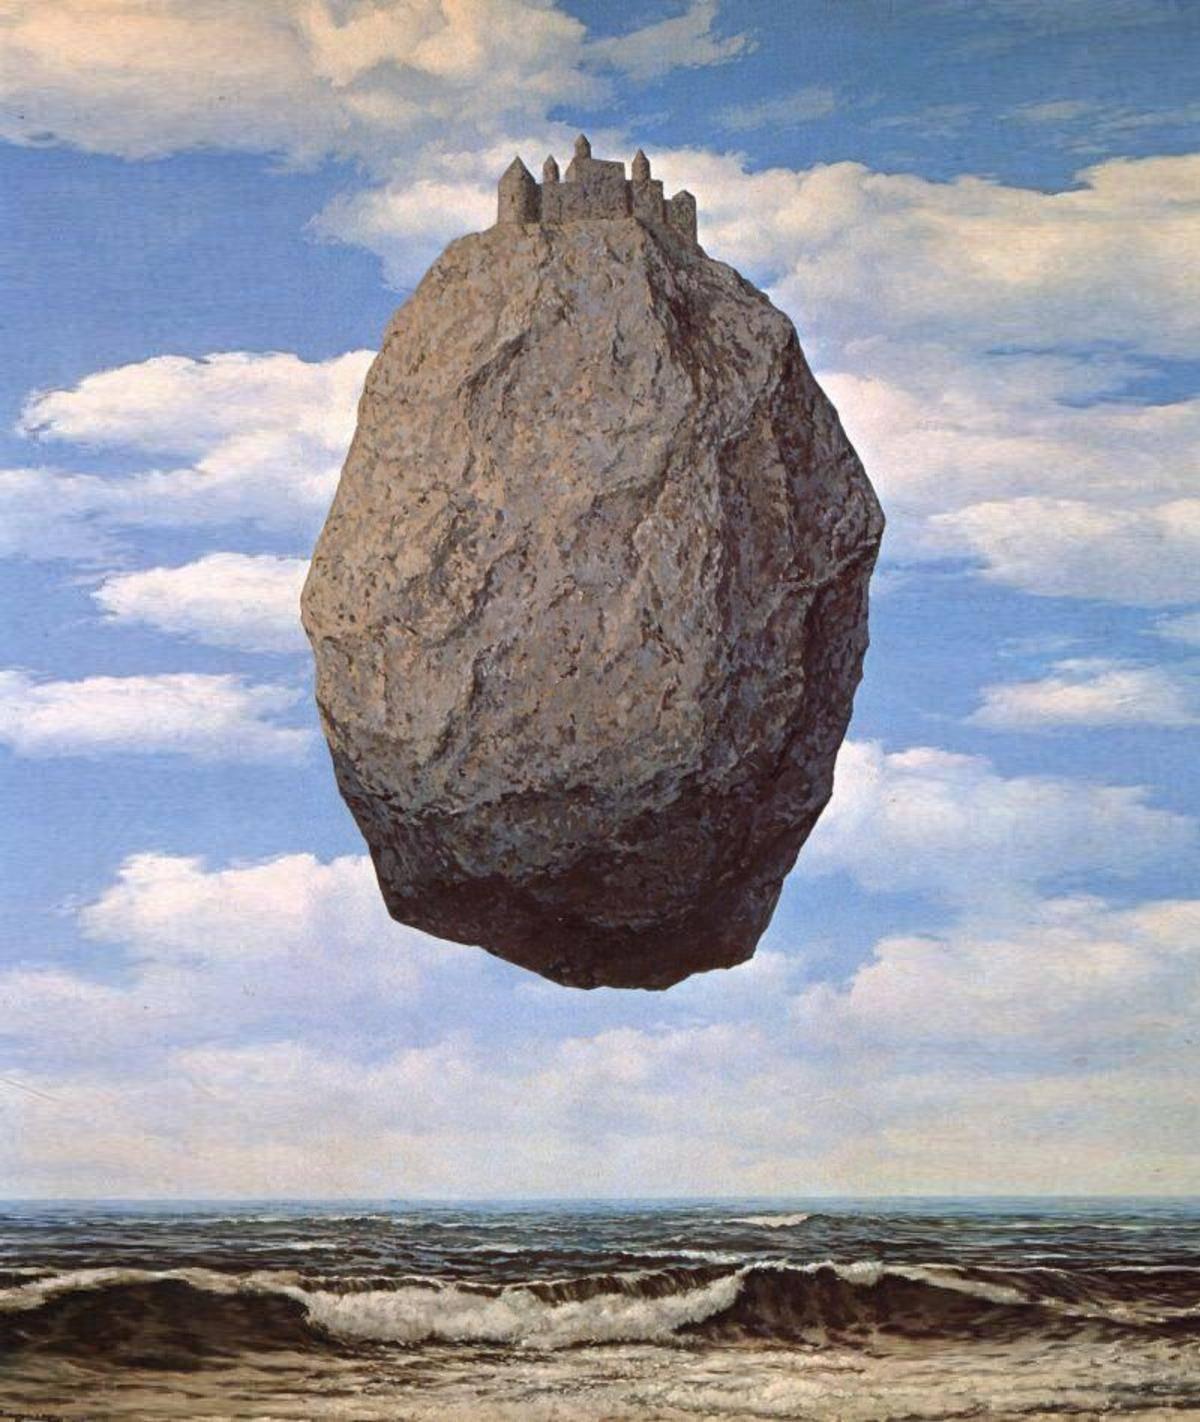 Rene Magritte 12002151422 Wallpaper 618891 1200x1422